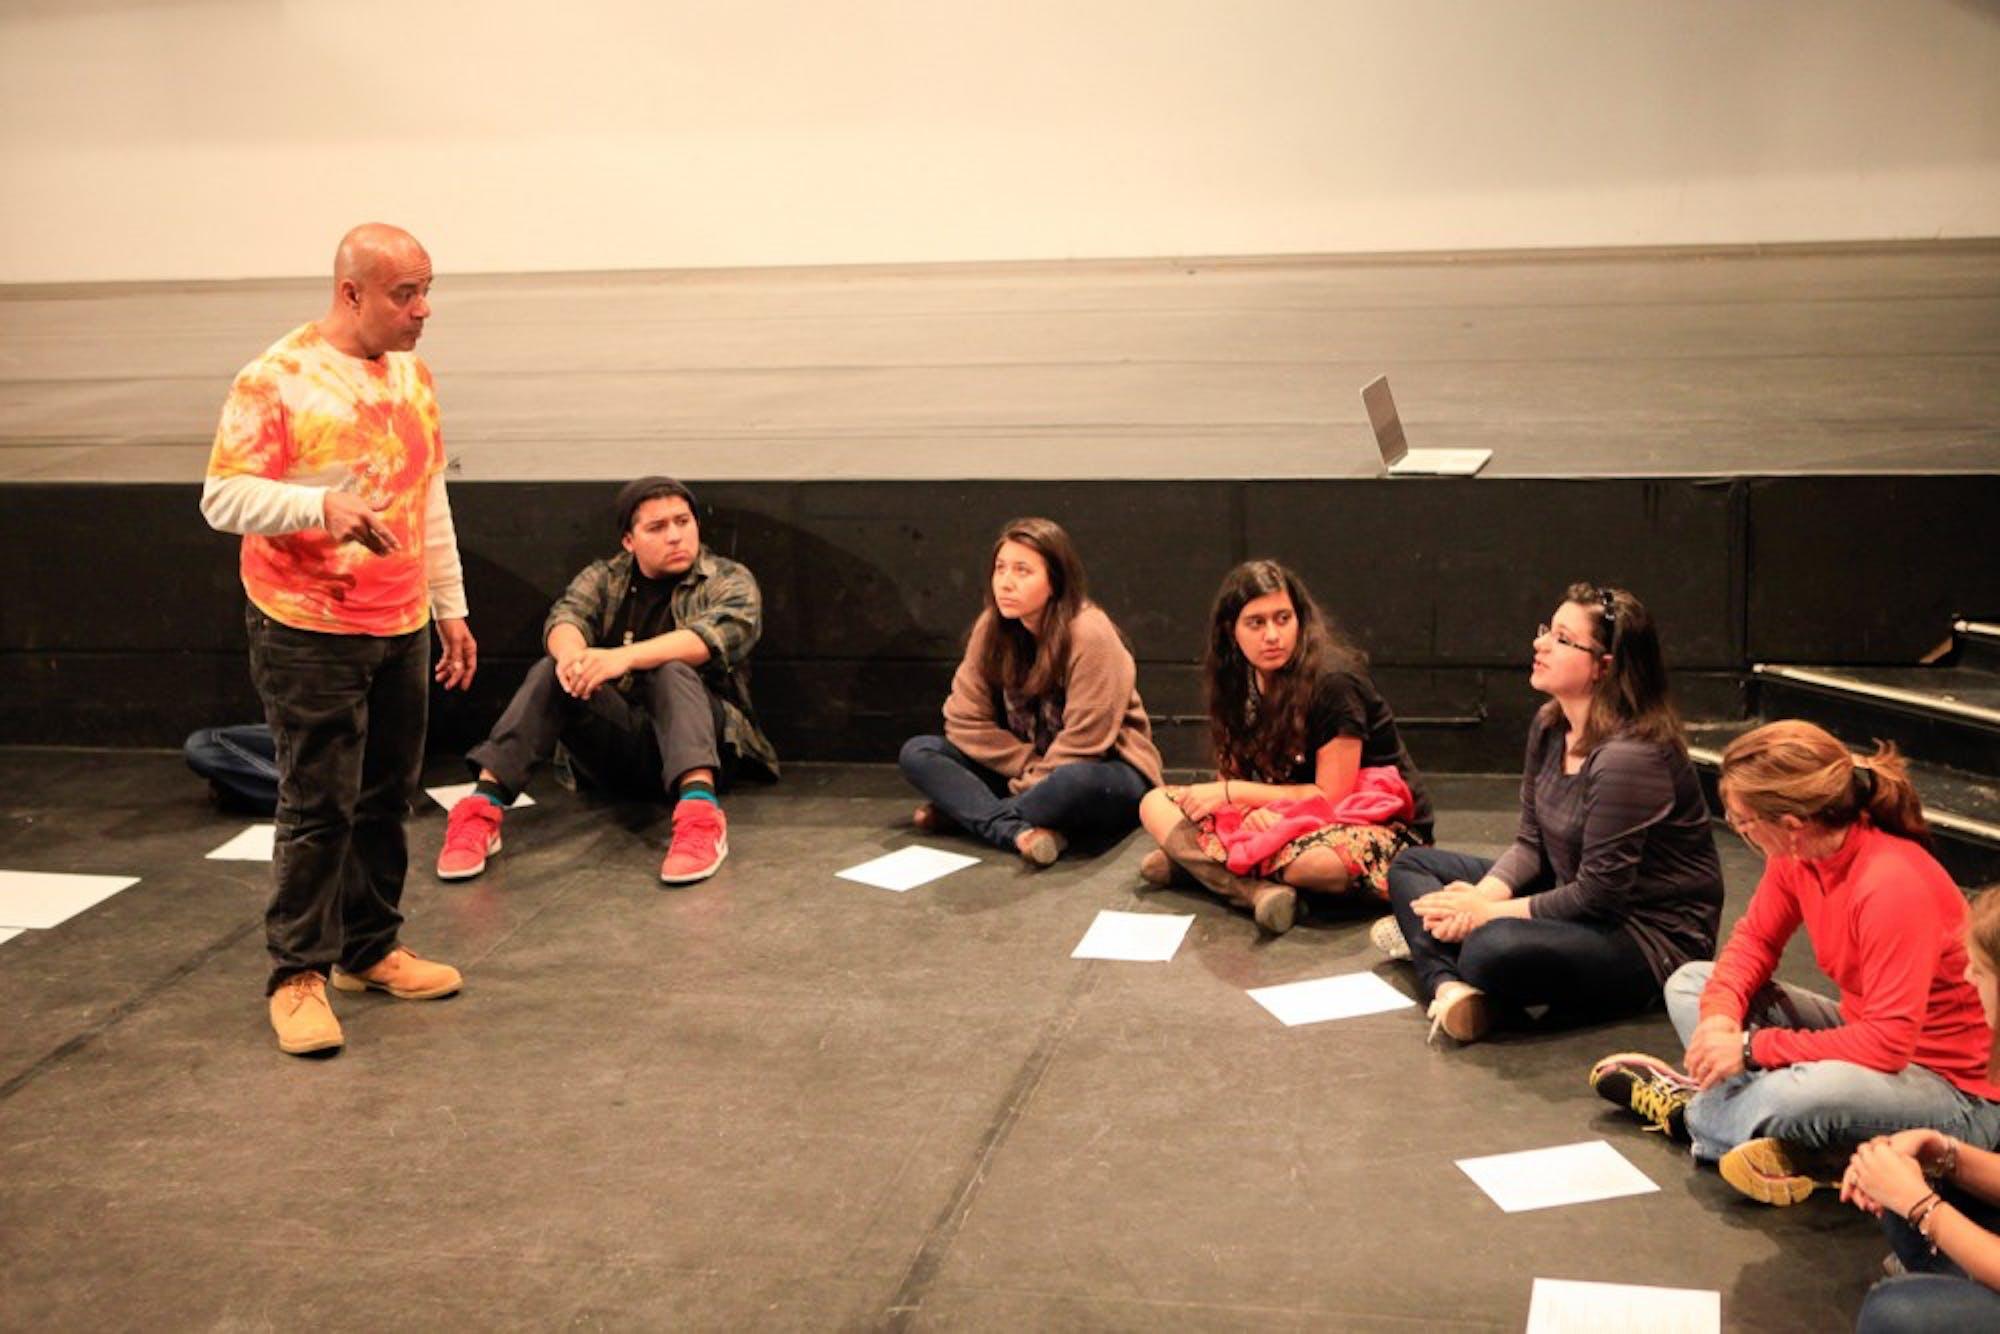 10-13-14-arts-theater-jeffrey-lee